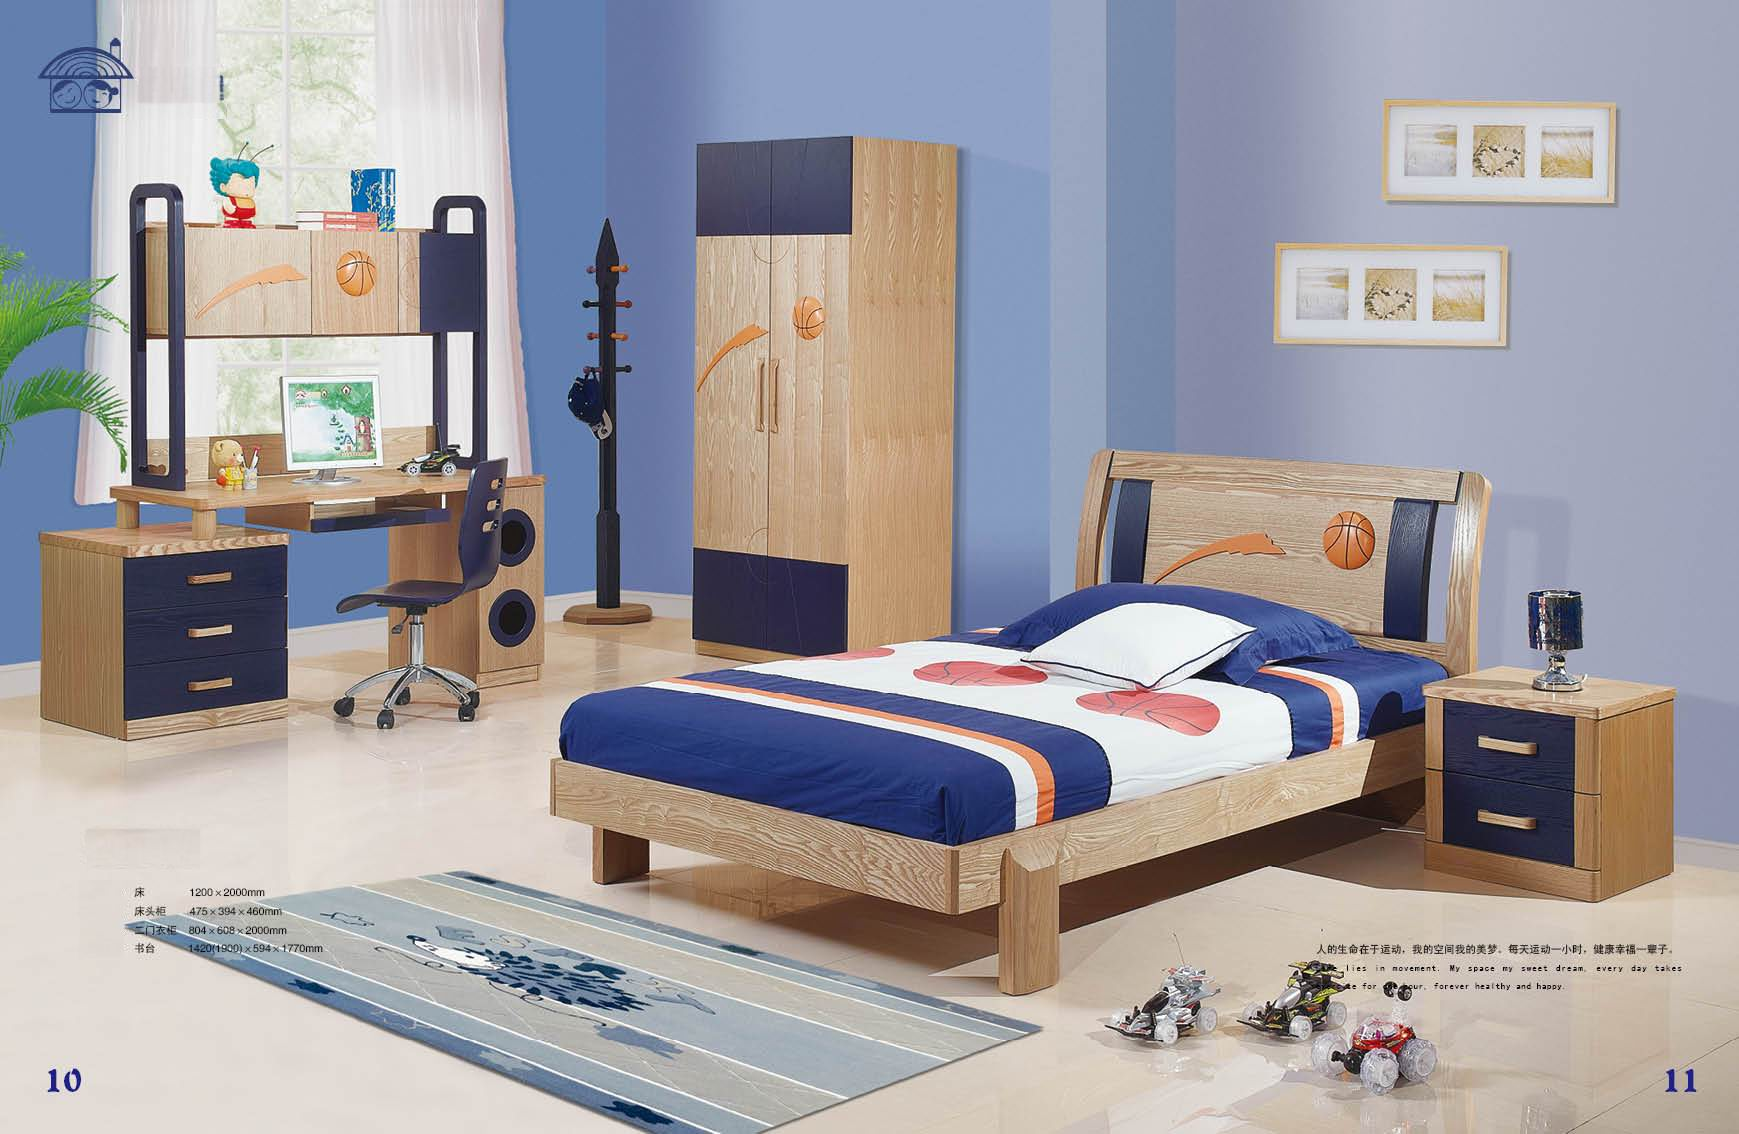 Vanity Children Bedroom Of Bunk Beds For Kids On Kids Ideas Acnn Decor